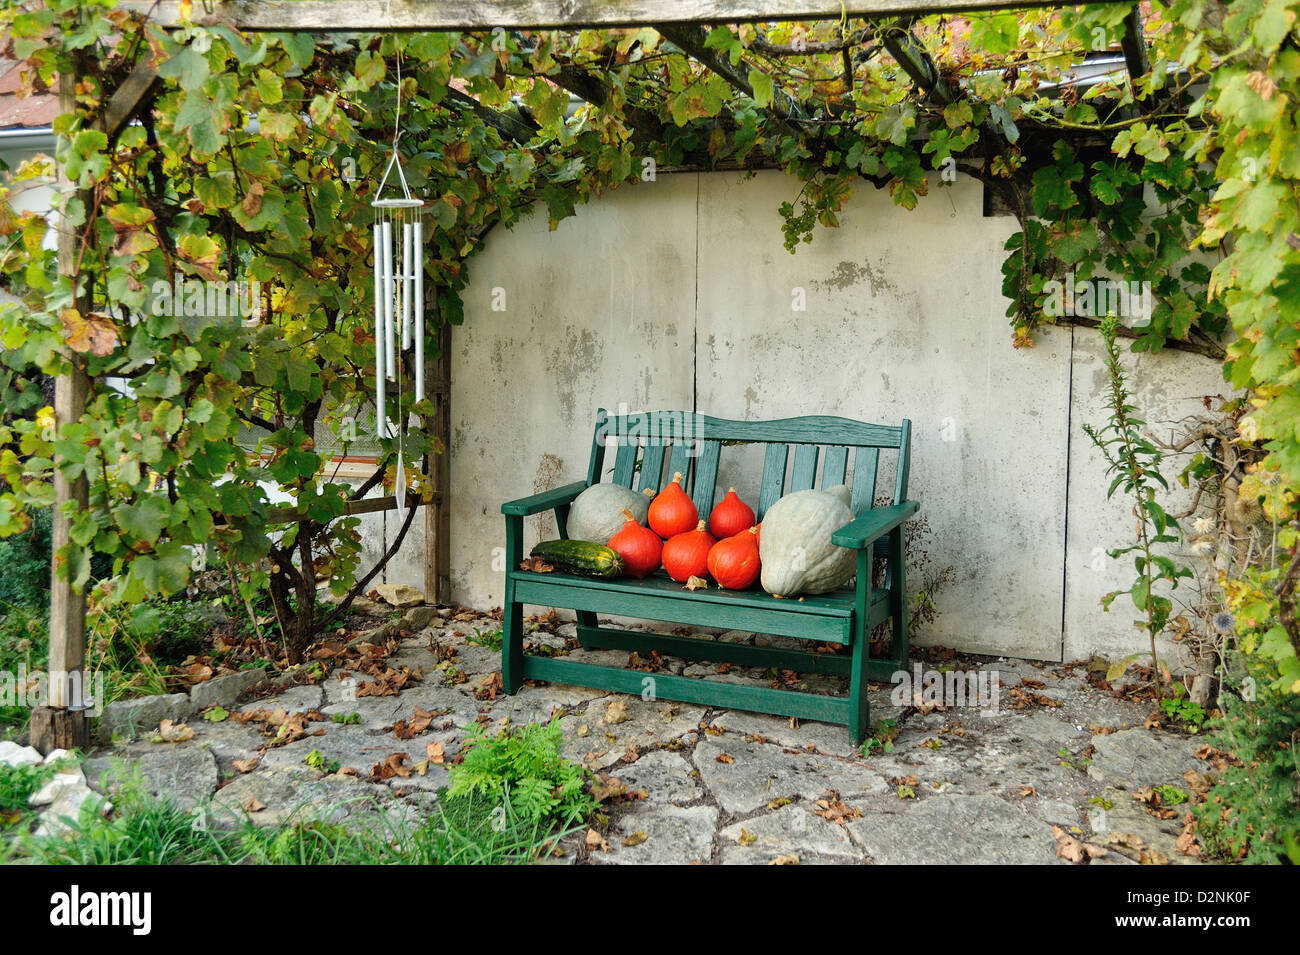 gartenpflanzen stockfotos gartenpflanzen bilder alamy. Black Bedroom Furniture Sets. Home Design Ideas